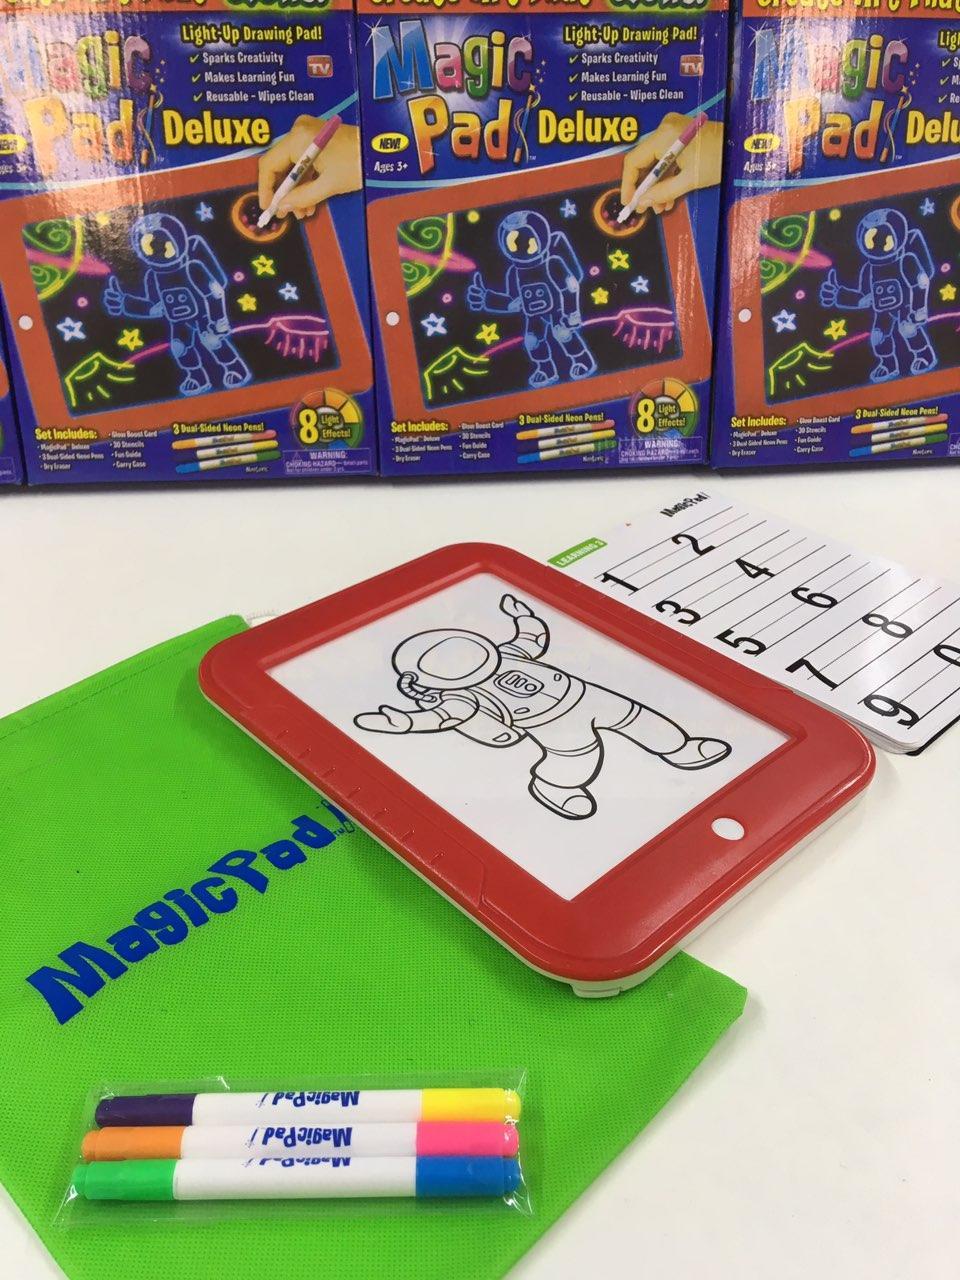 Доска для рисования Magic Pad deluxe ART-2606/ EL-615 (60 шт/ящ)